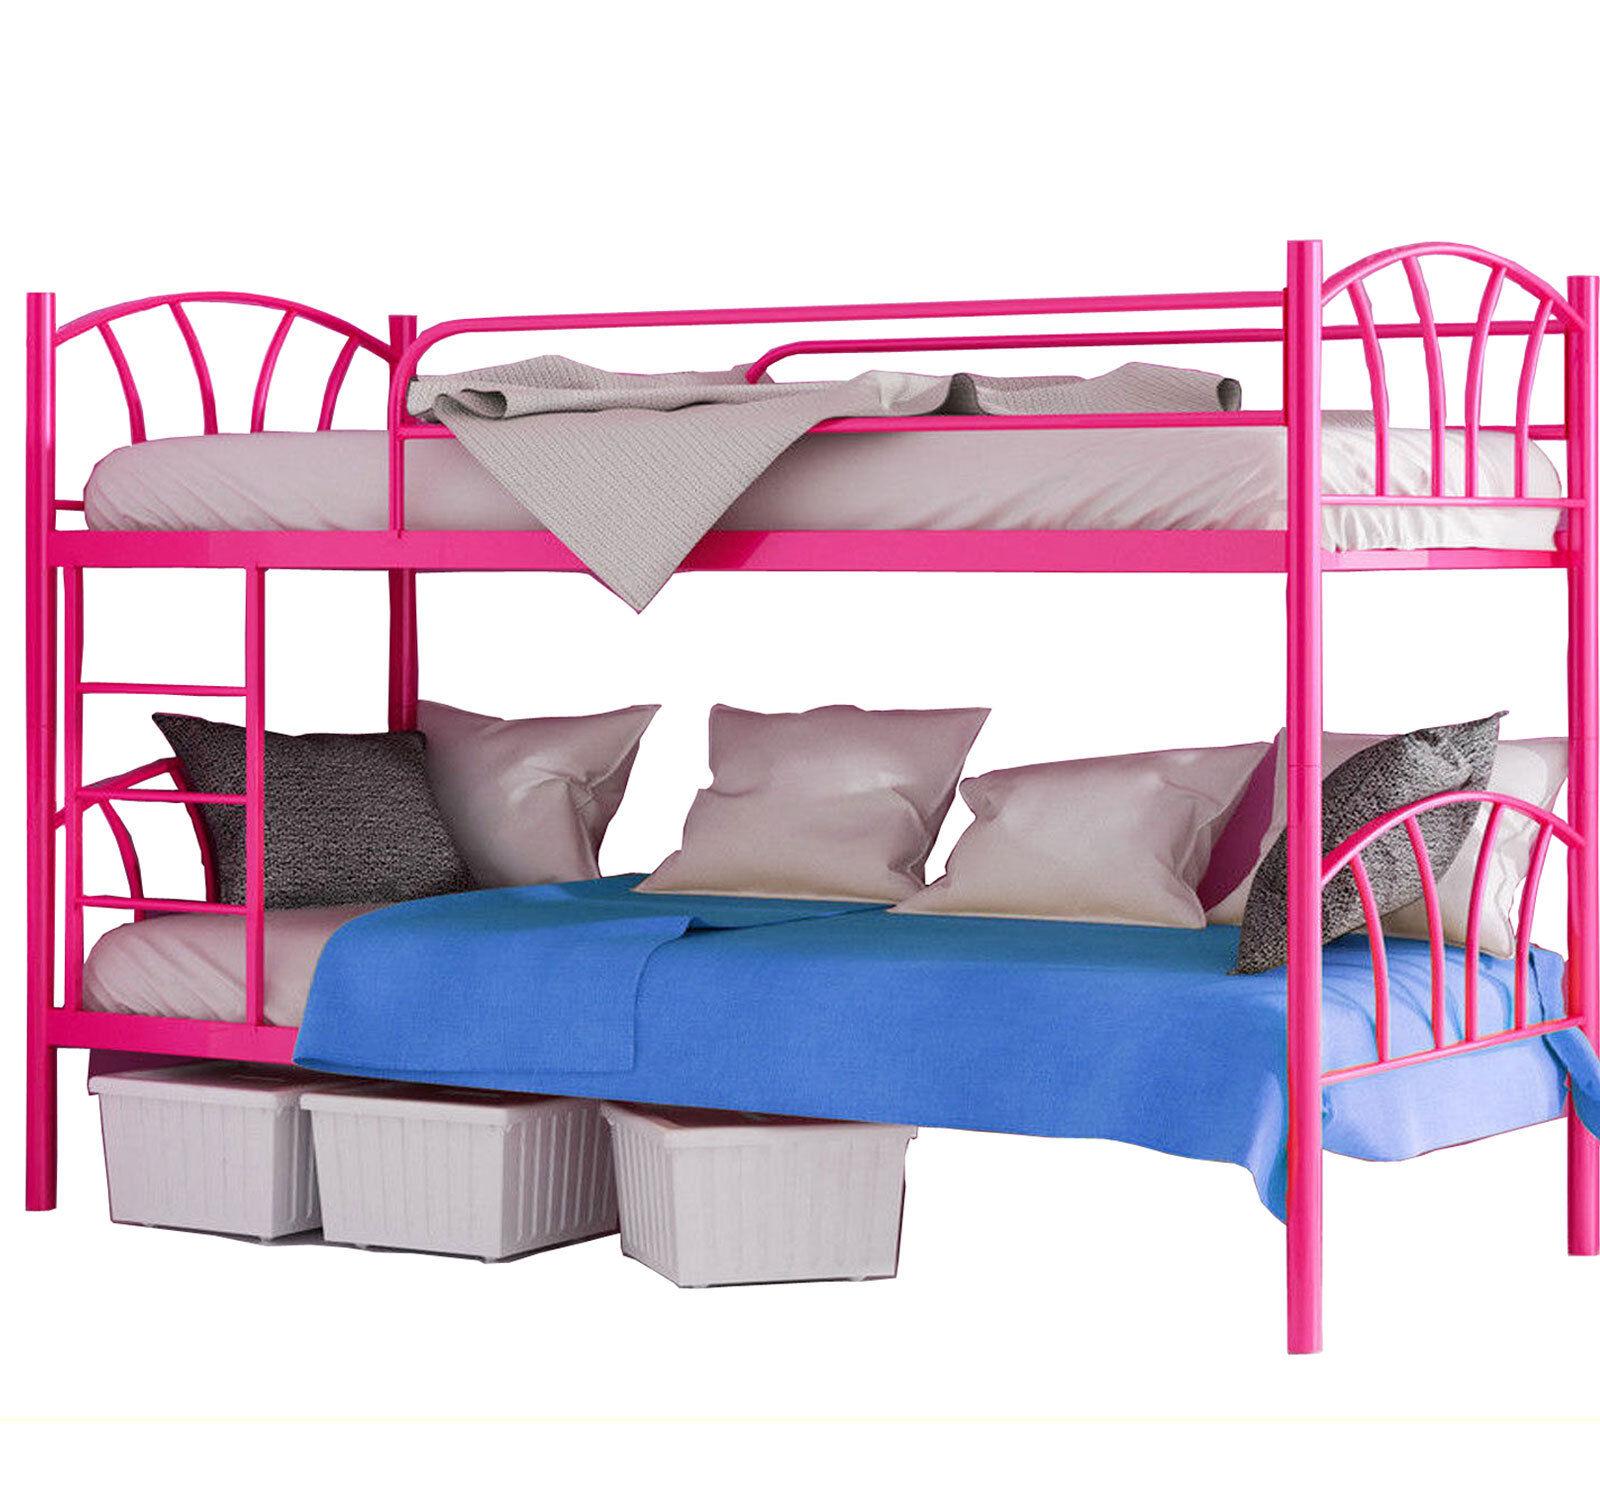 Etagenbett Hochbett Metall Stockbett 90x200 Kinderbett Belastbarkeit